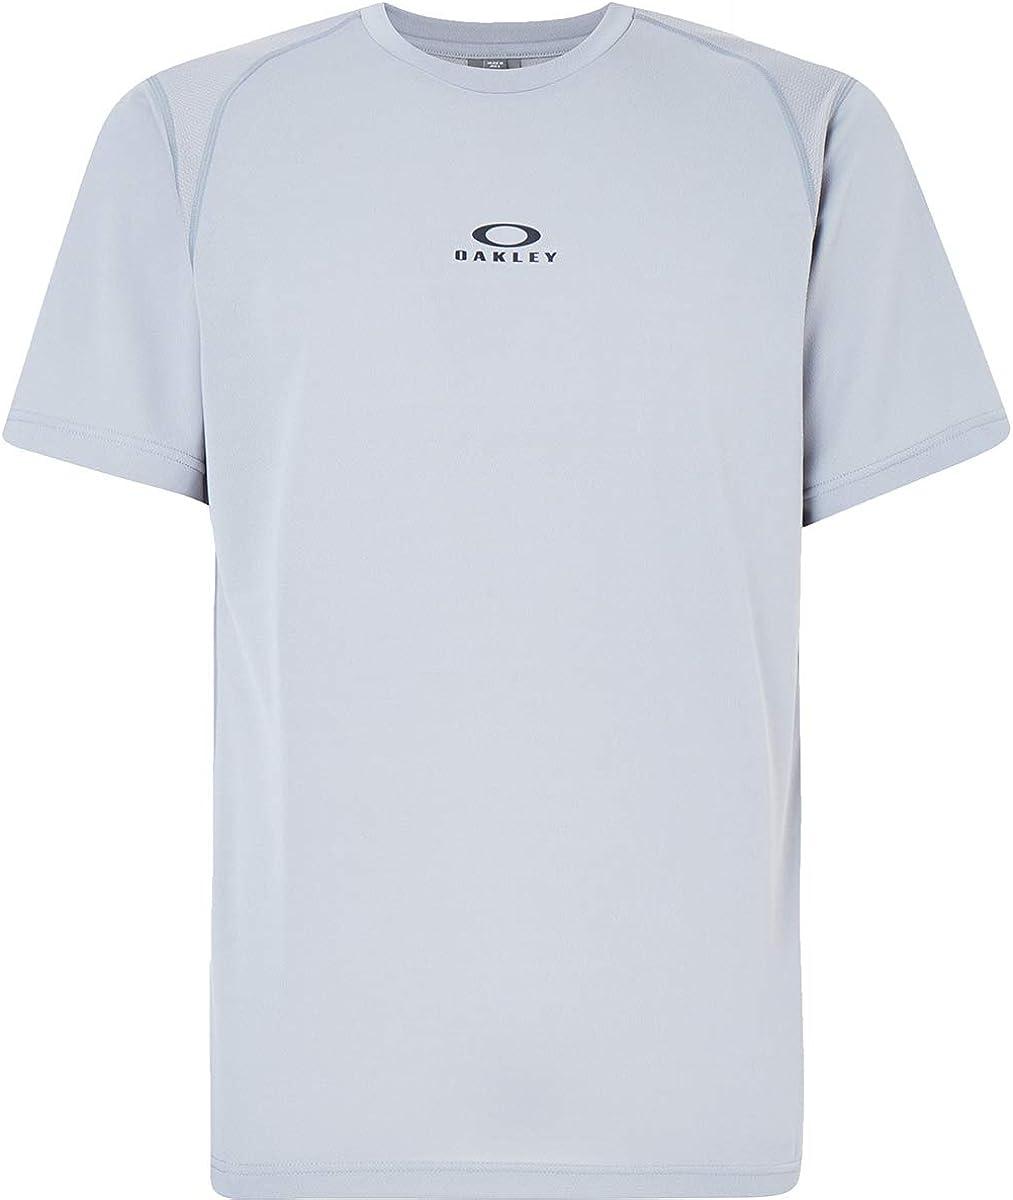 Oakley Men's Foundational Tee Cheap sale Mail order cheap Training Ss